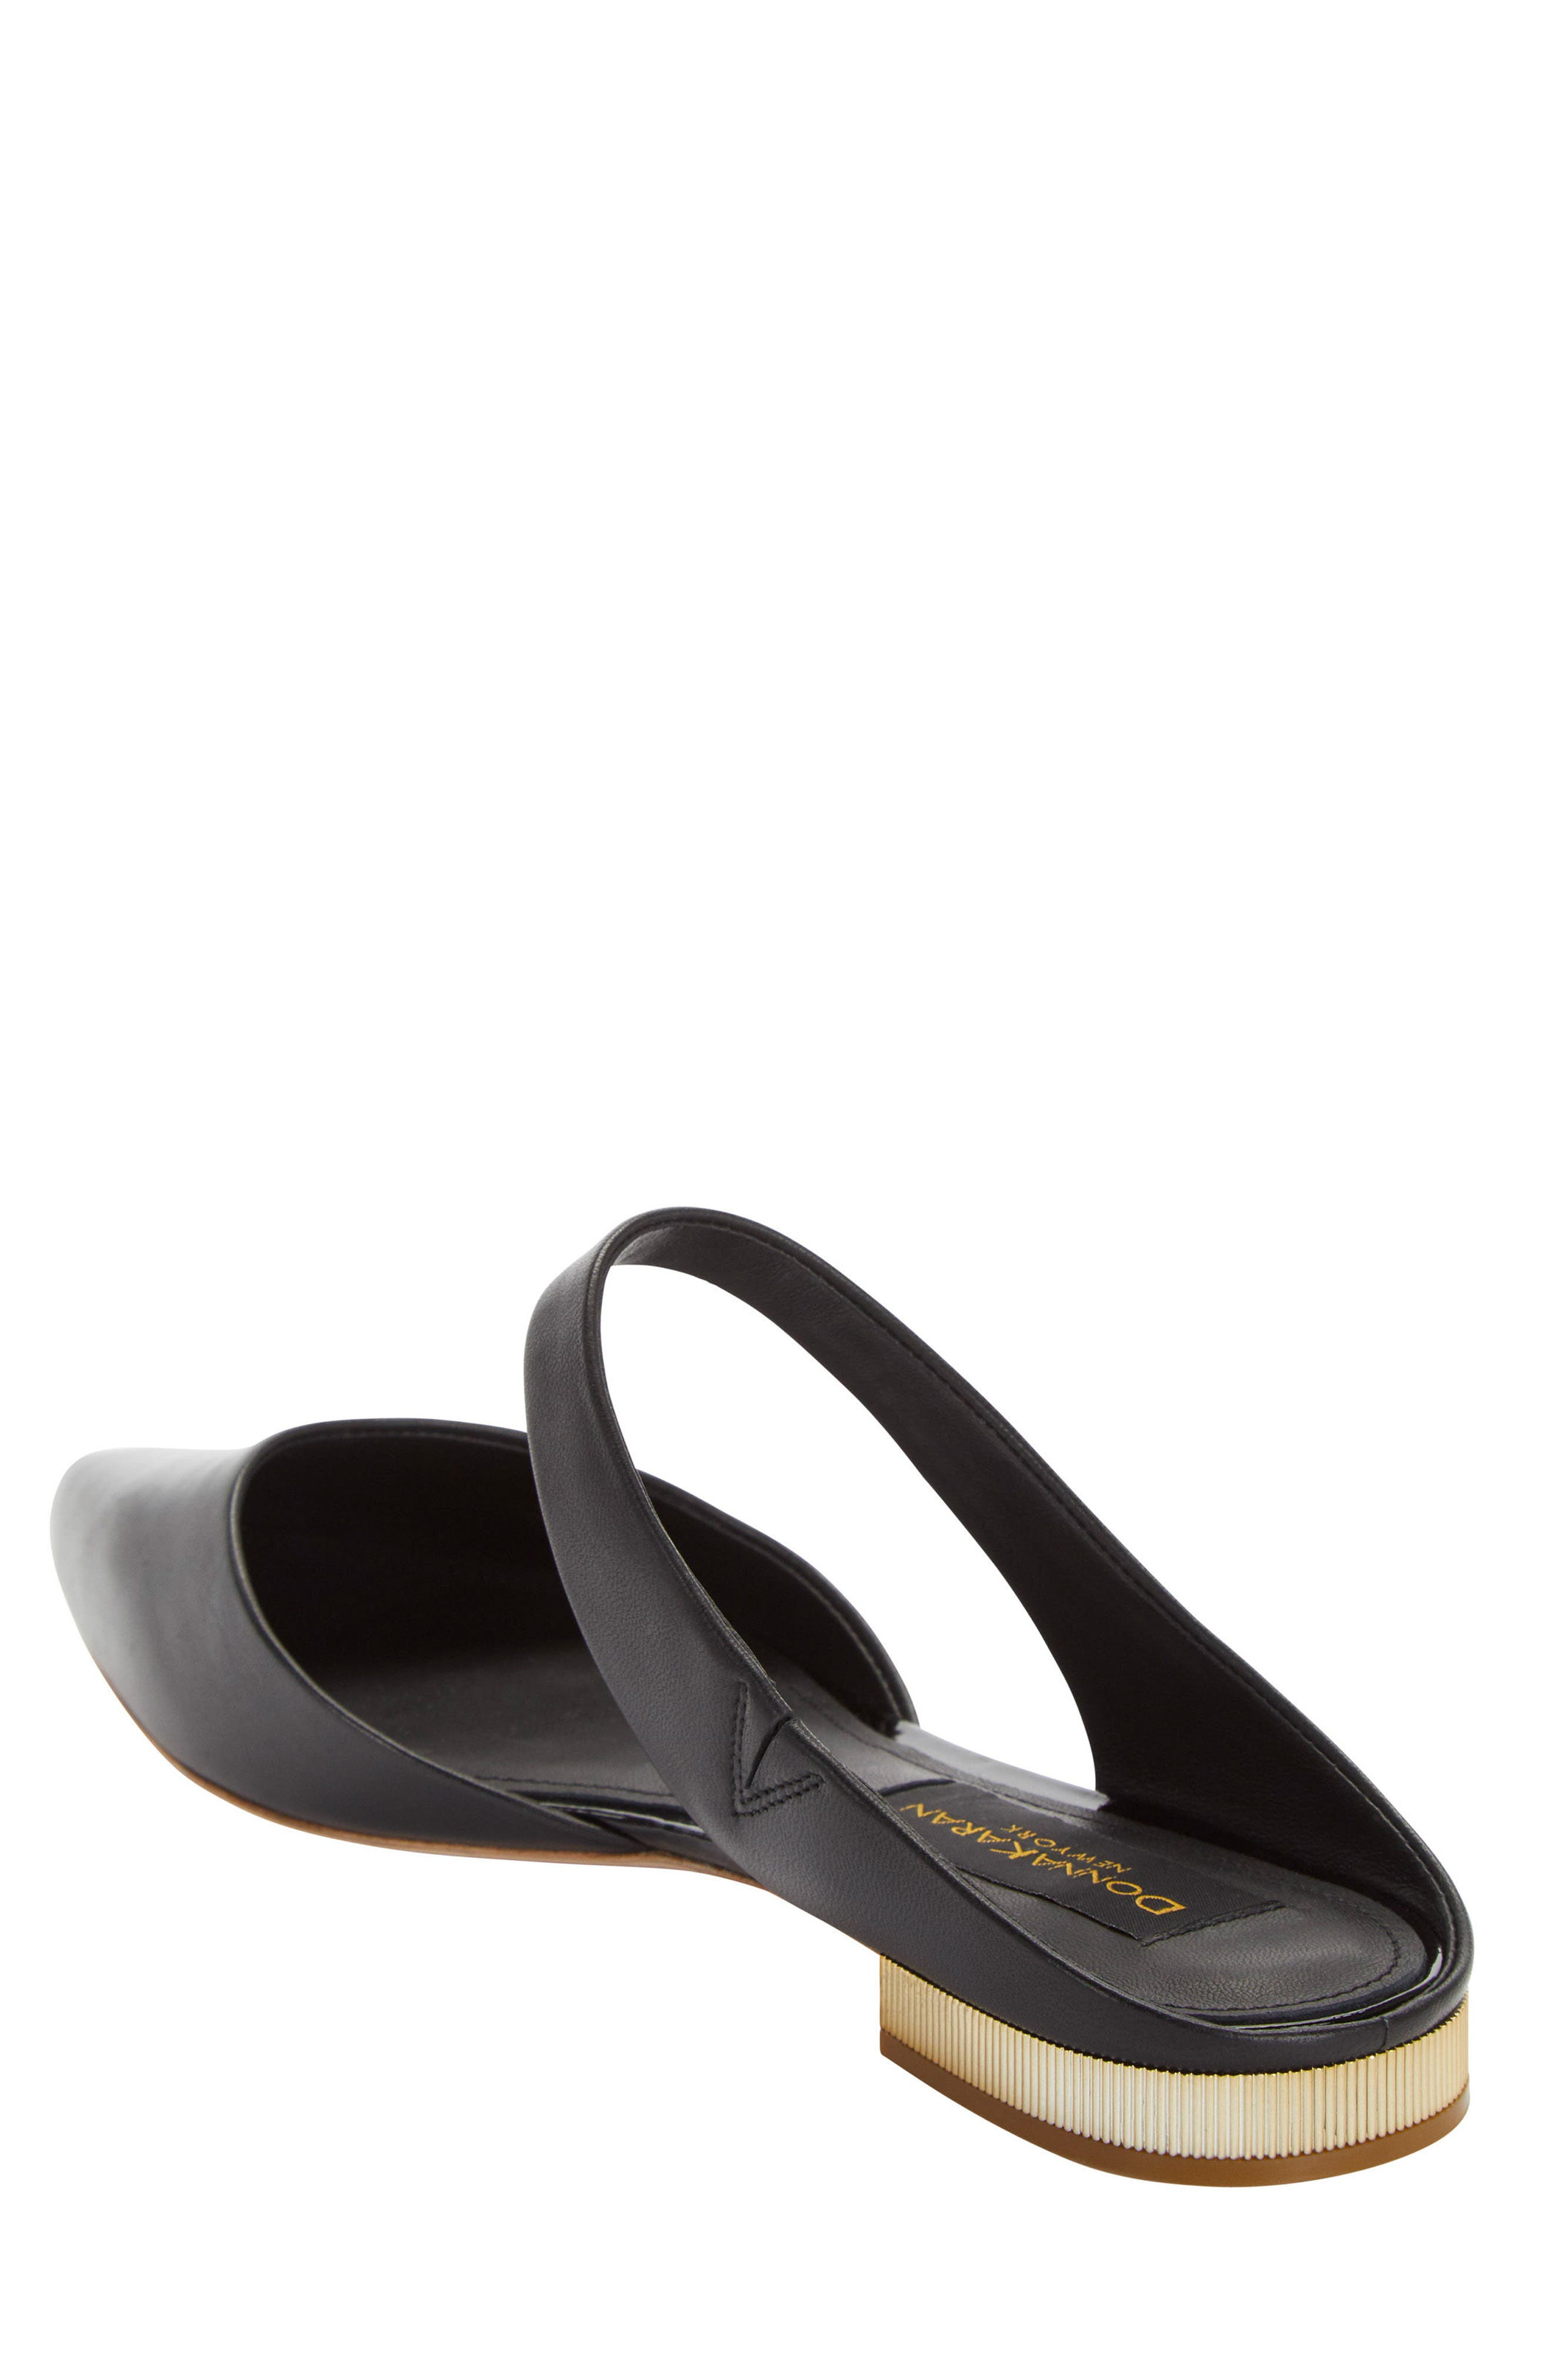 Donna Karan Paris Pointy Toe Mule,                             Alternate thumbnail 2, color,                             Black Leather